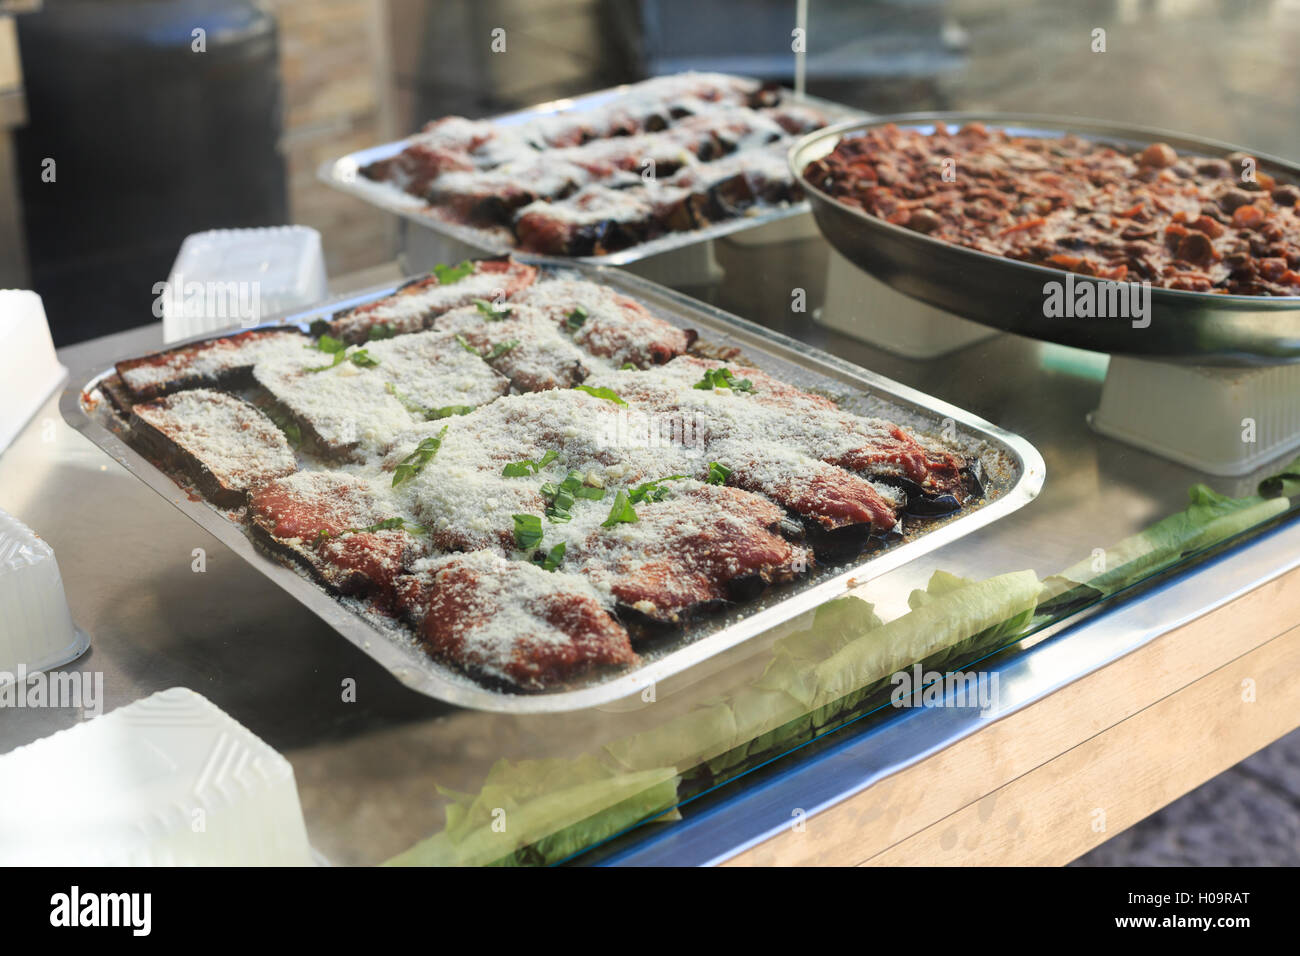 Parmigiana di melanzane, marché Ballarò, Palerme, Sicile Photo Stock